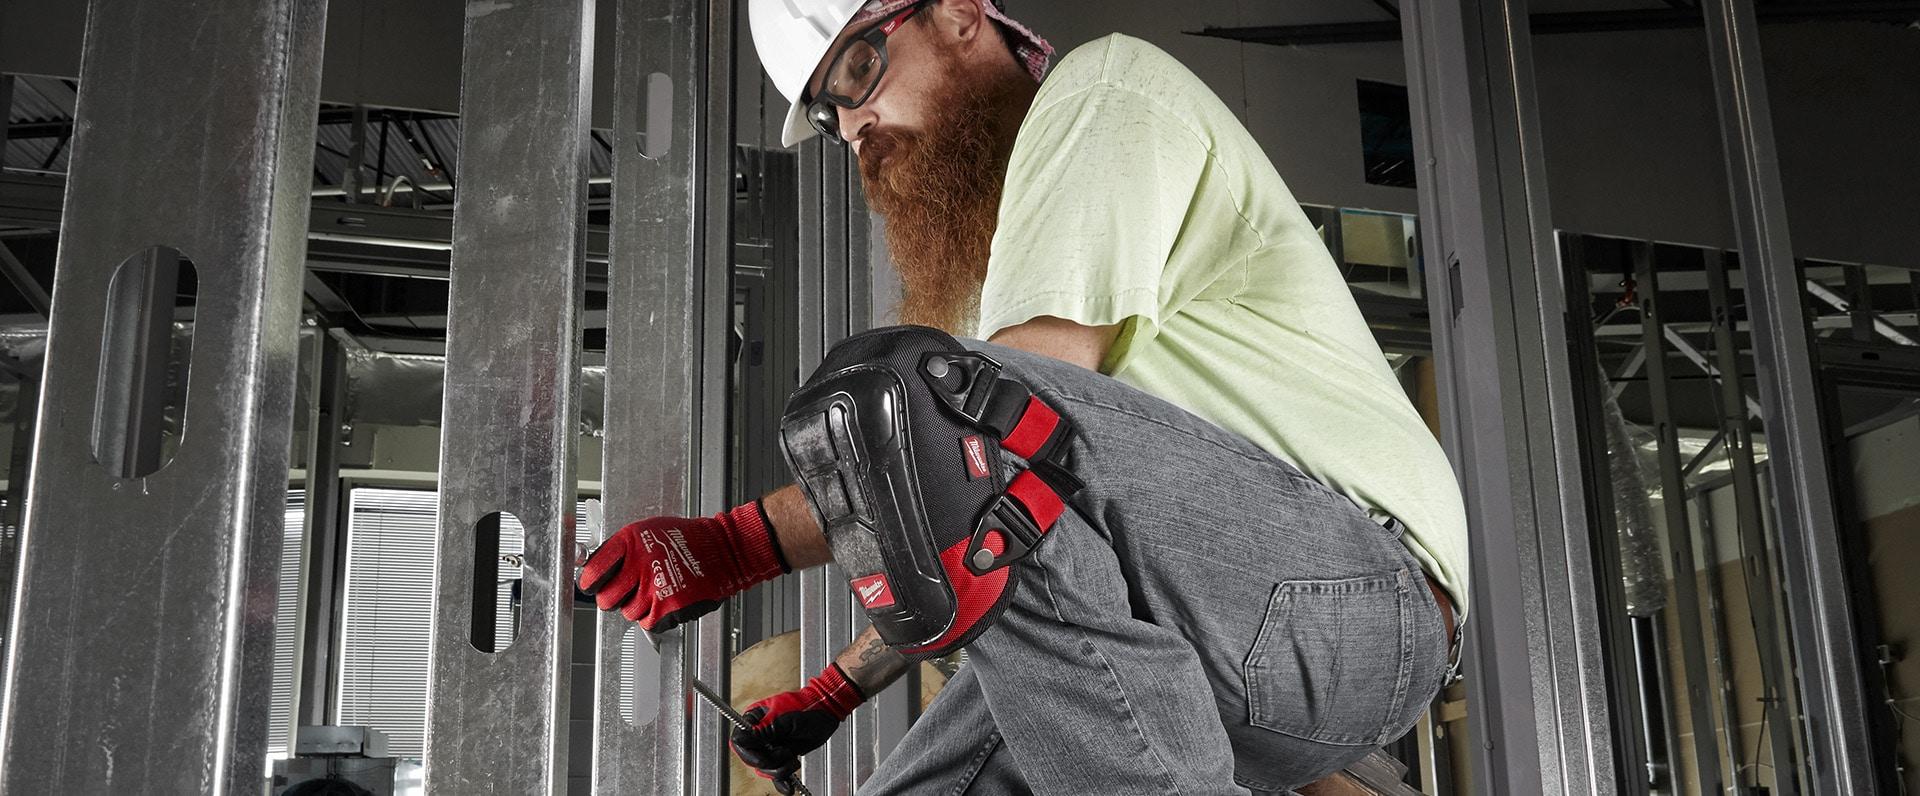 Free Knee Pads from Milwaukee Tools